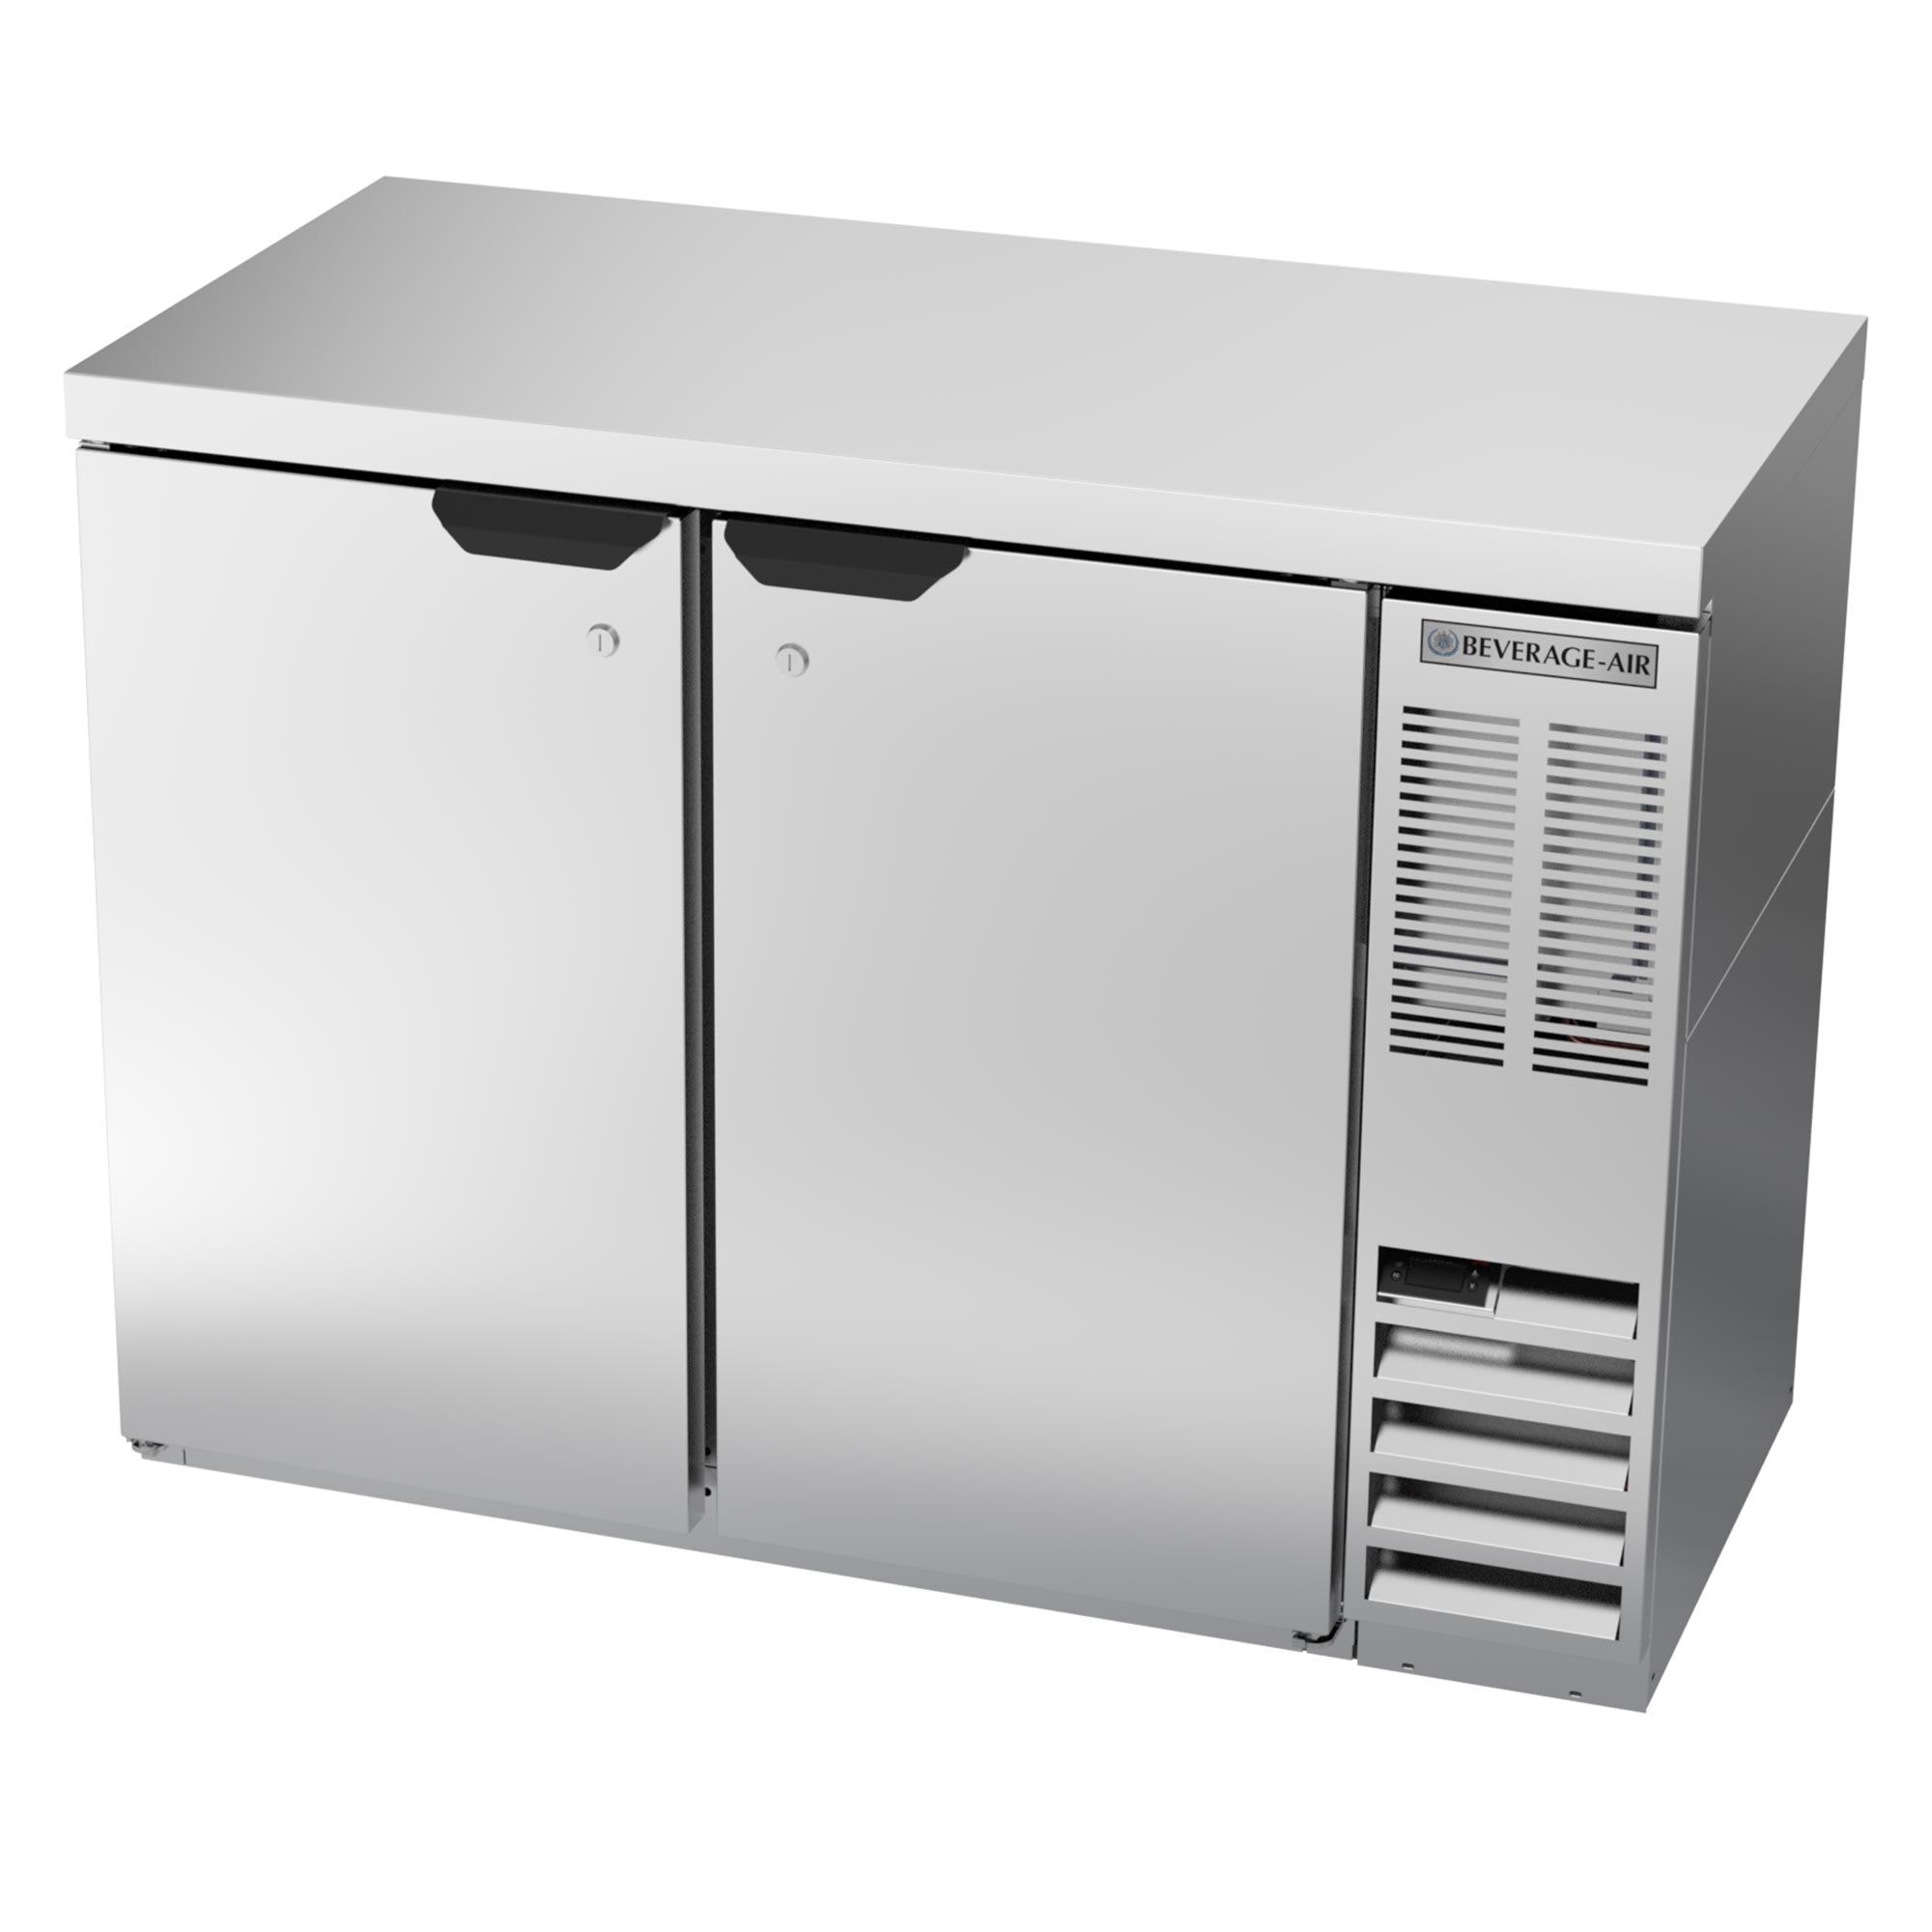 "Beverage Air BB48HC-1-S-27 48"" (2) Section Bar Refrigerator - Swinging Solid Door, 115v"